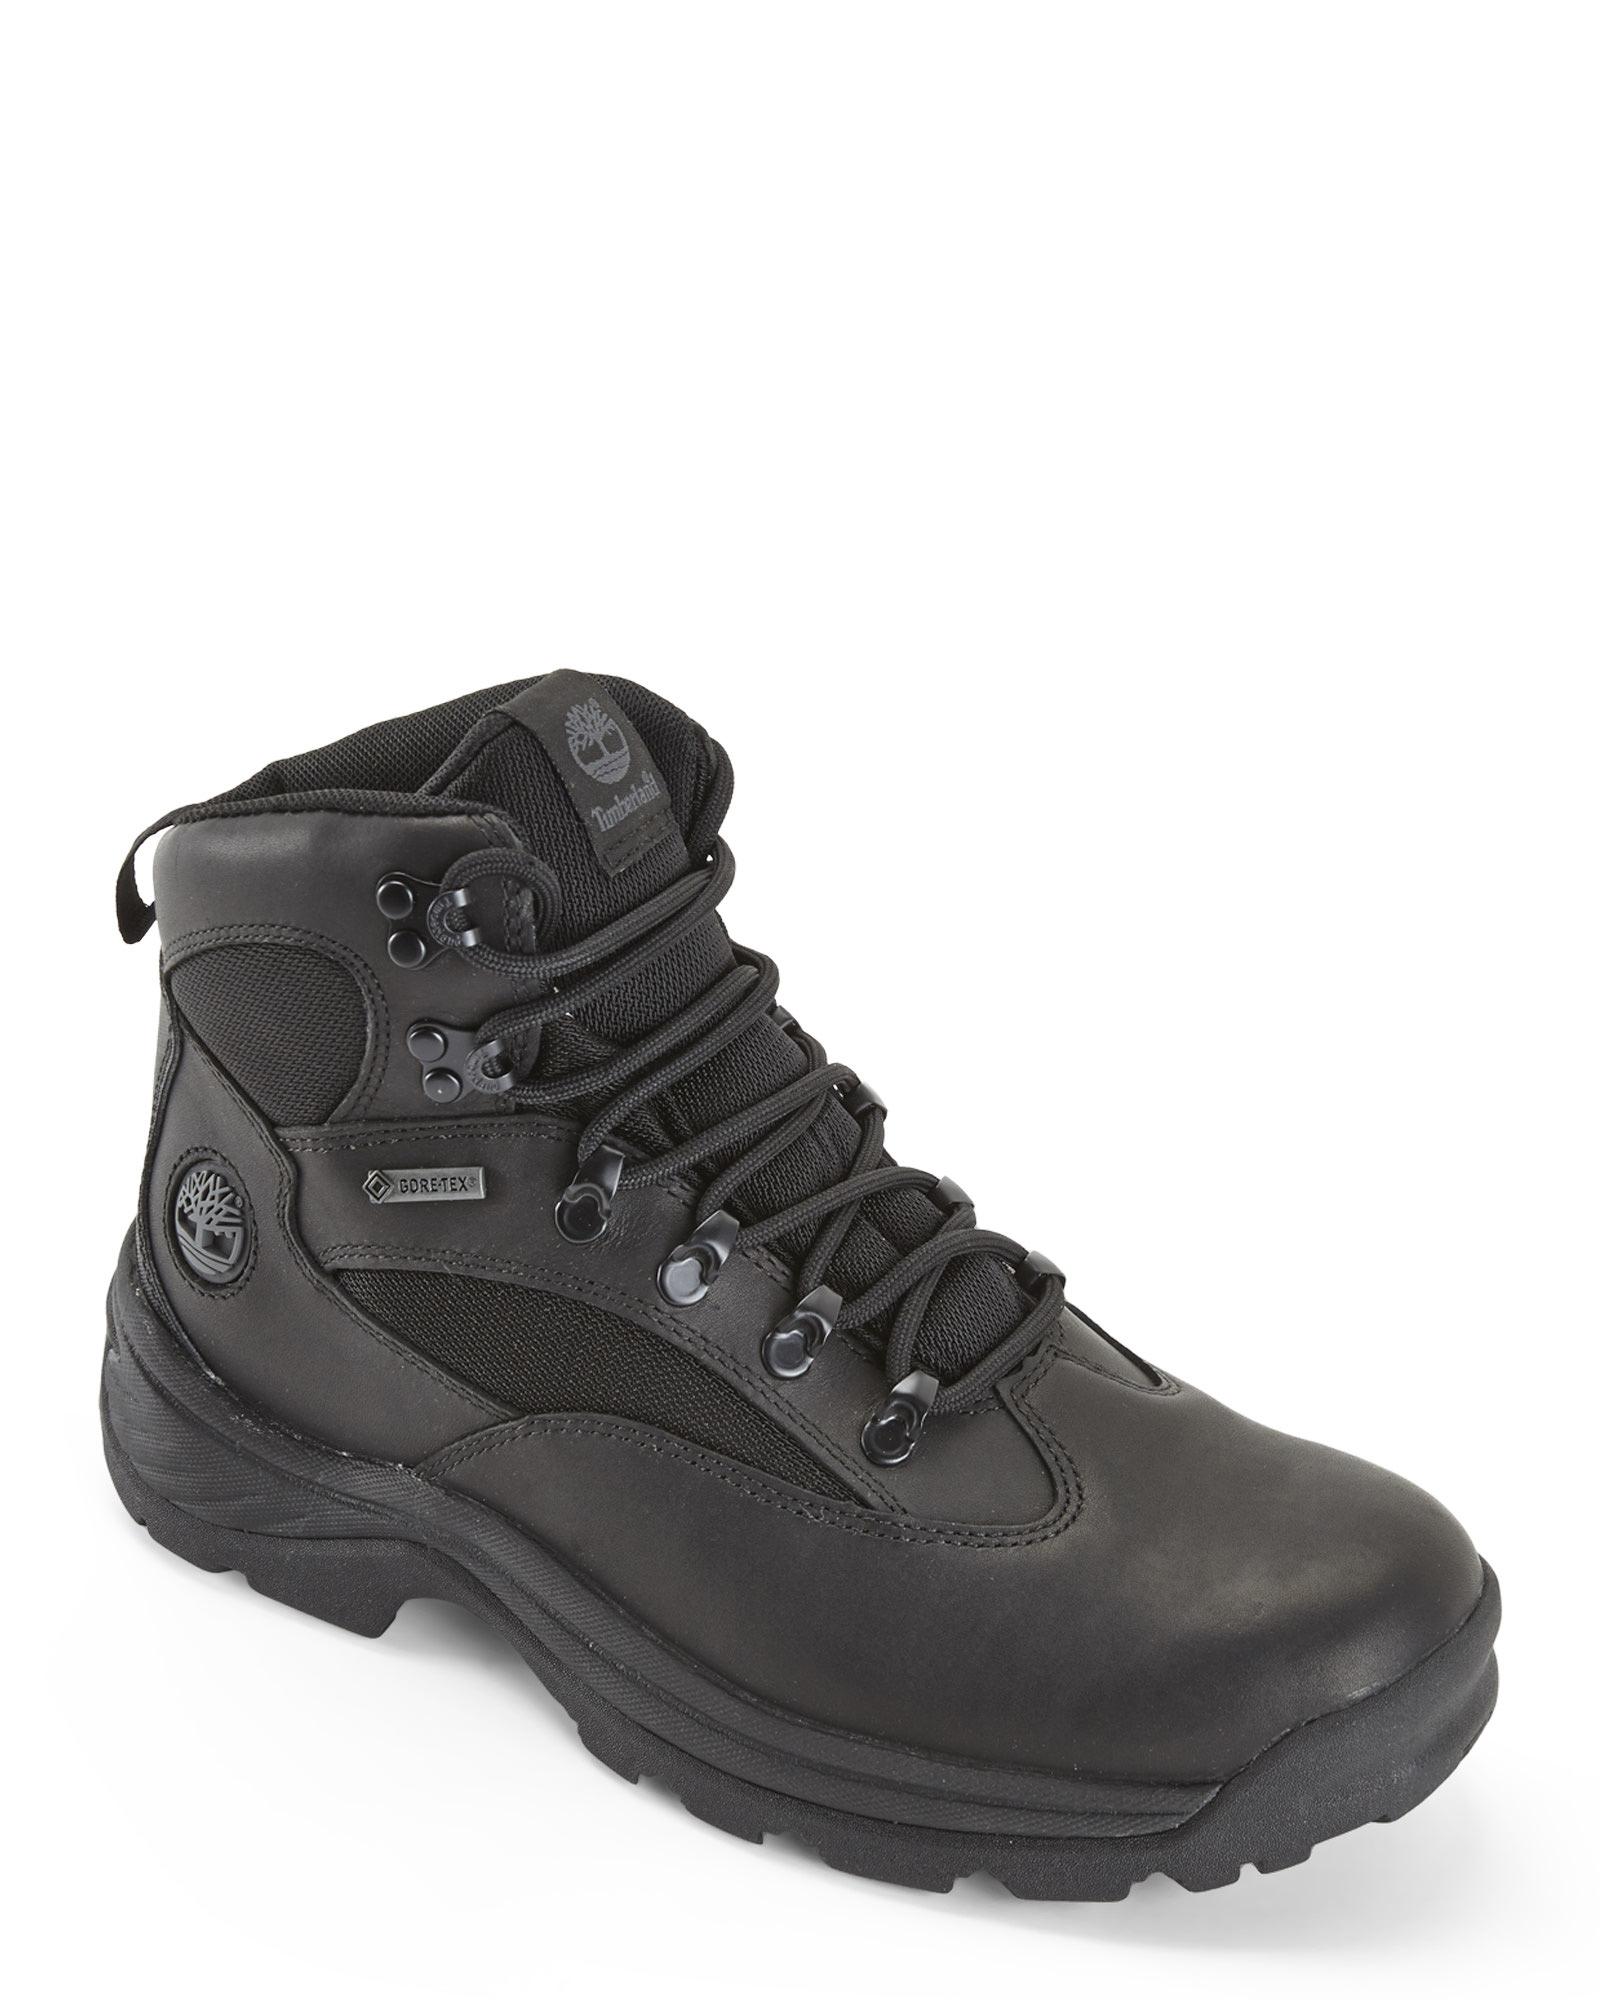 timberland waterproof chocorua trail gore-tex hiker boots black